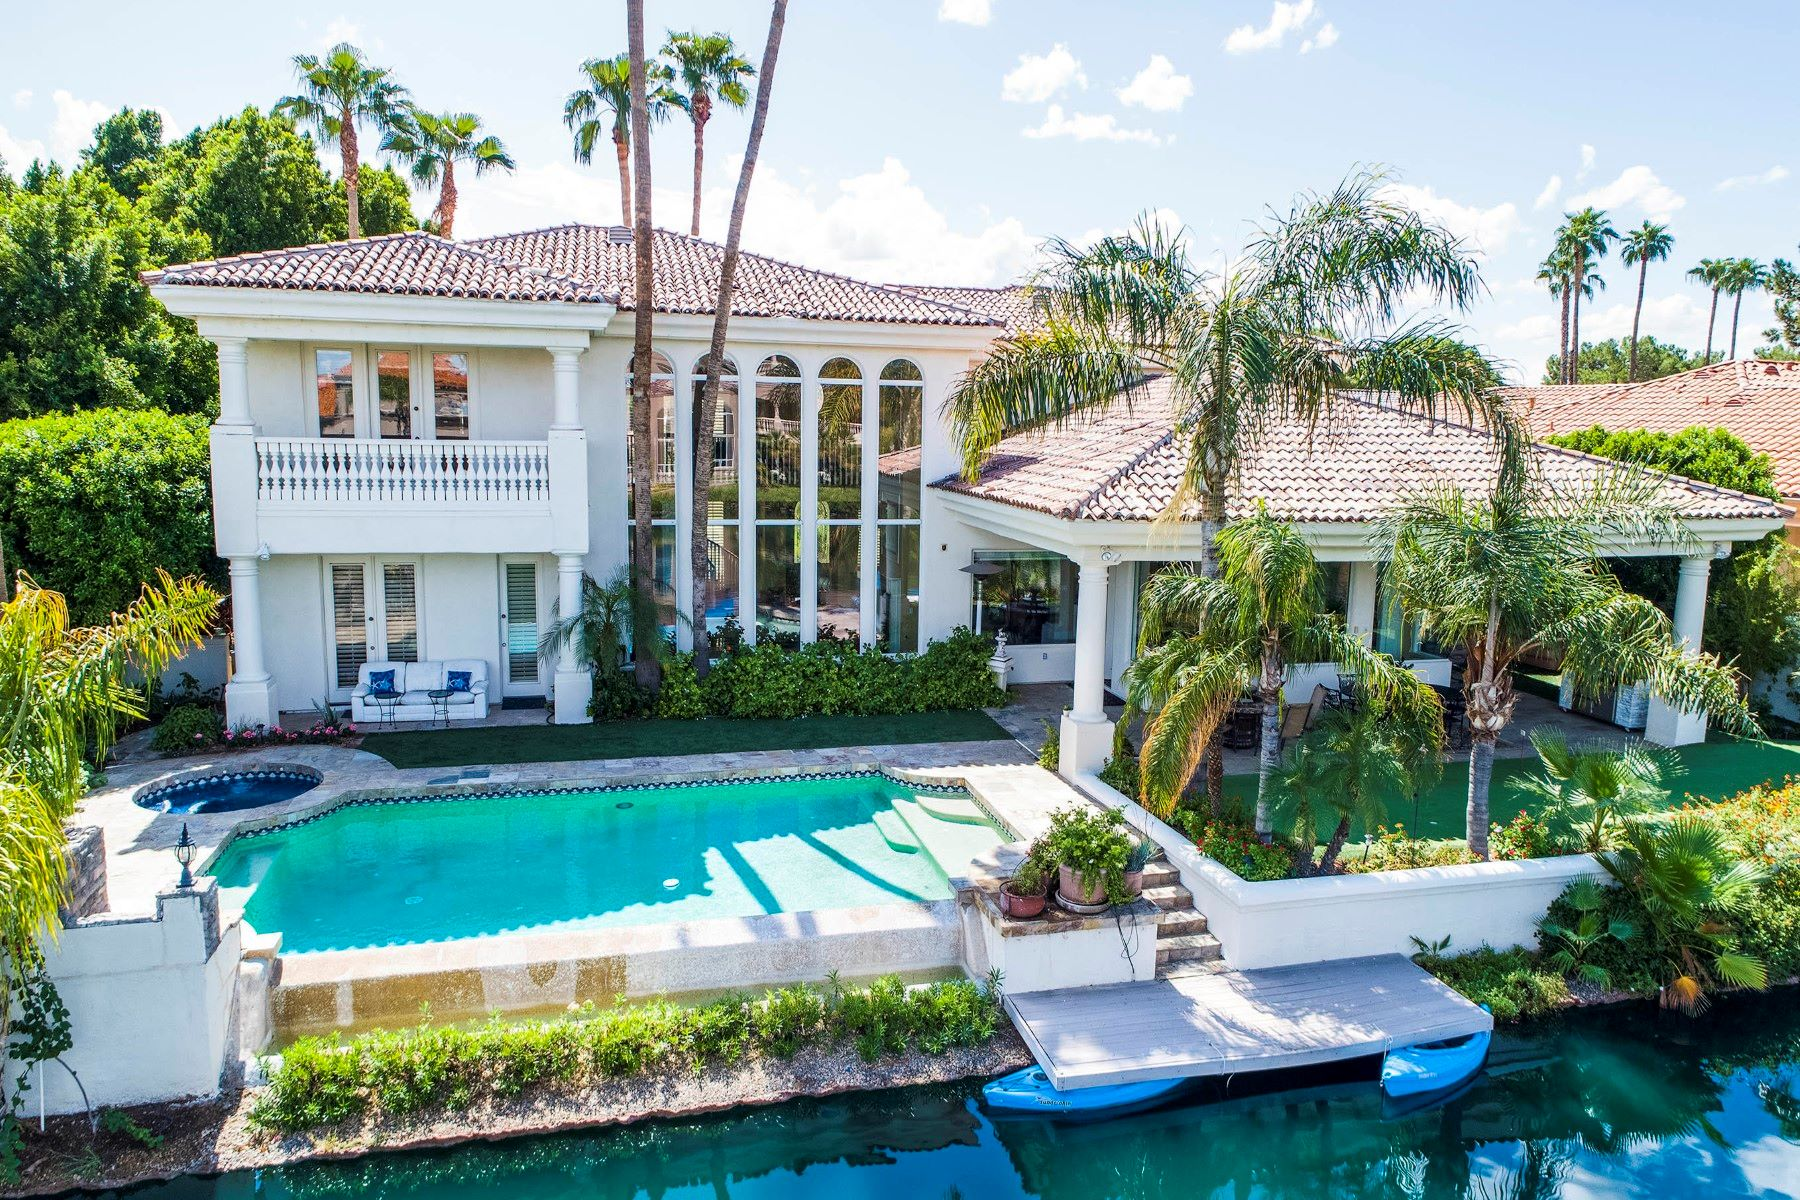 Single Family Homes for Sale at West Lake Estates 1320 E TREASURE COVE DR Gilbert, Arizona 85234 United States